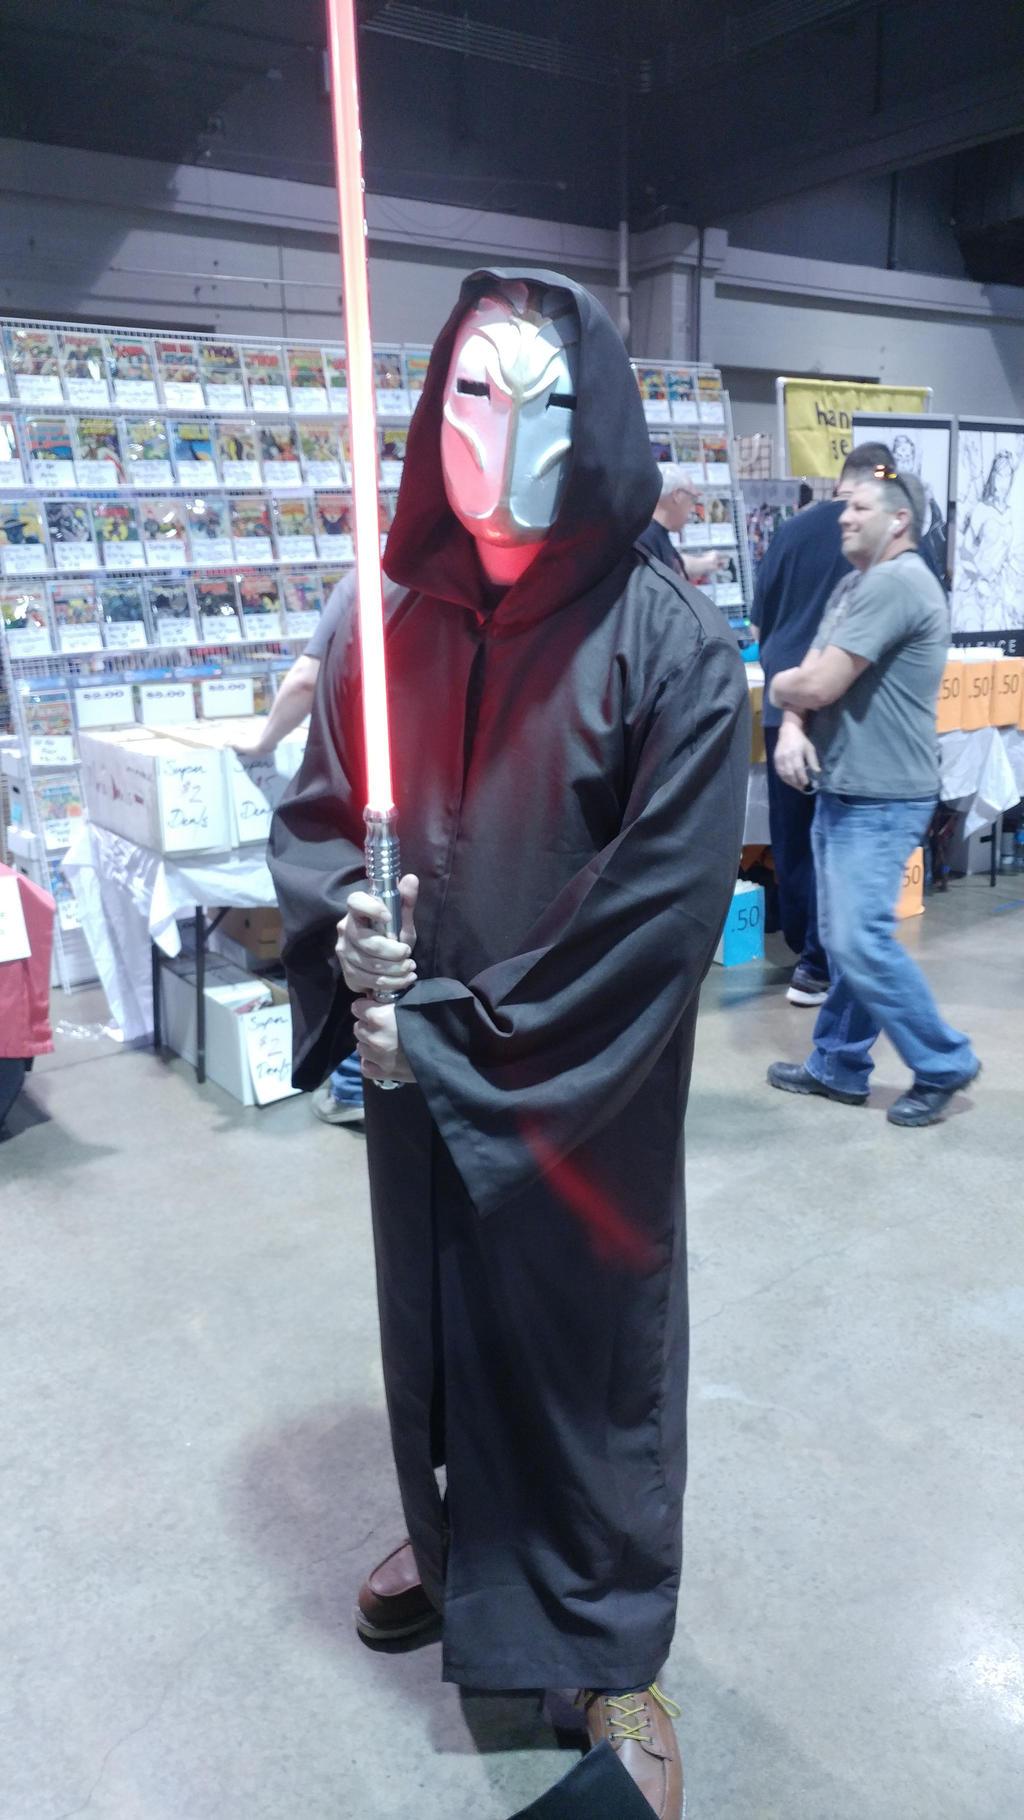 Jedi Cosplay by FelgrandKnight34